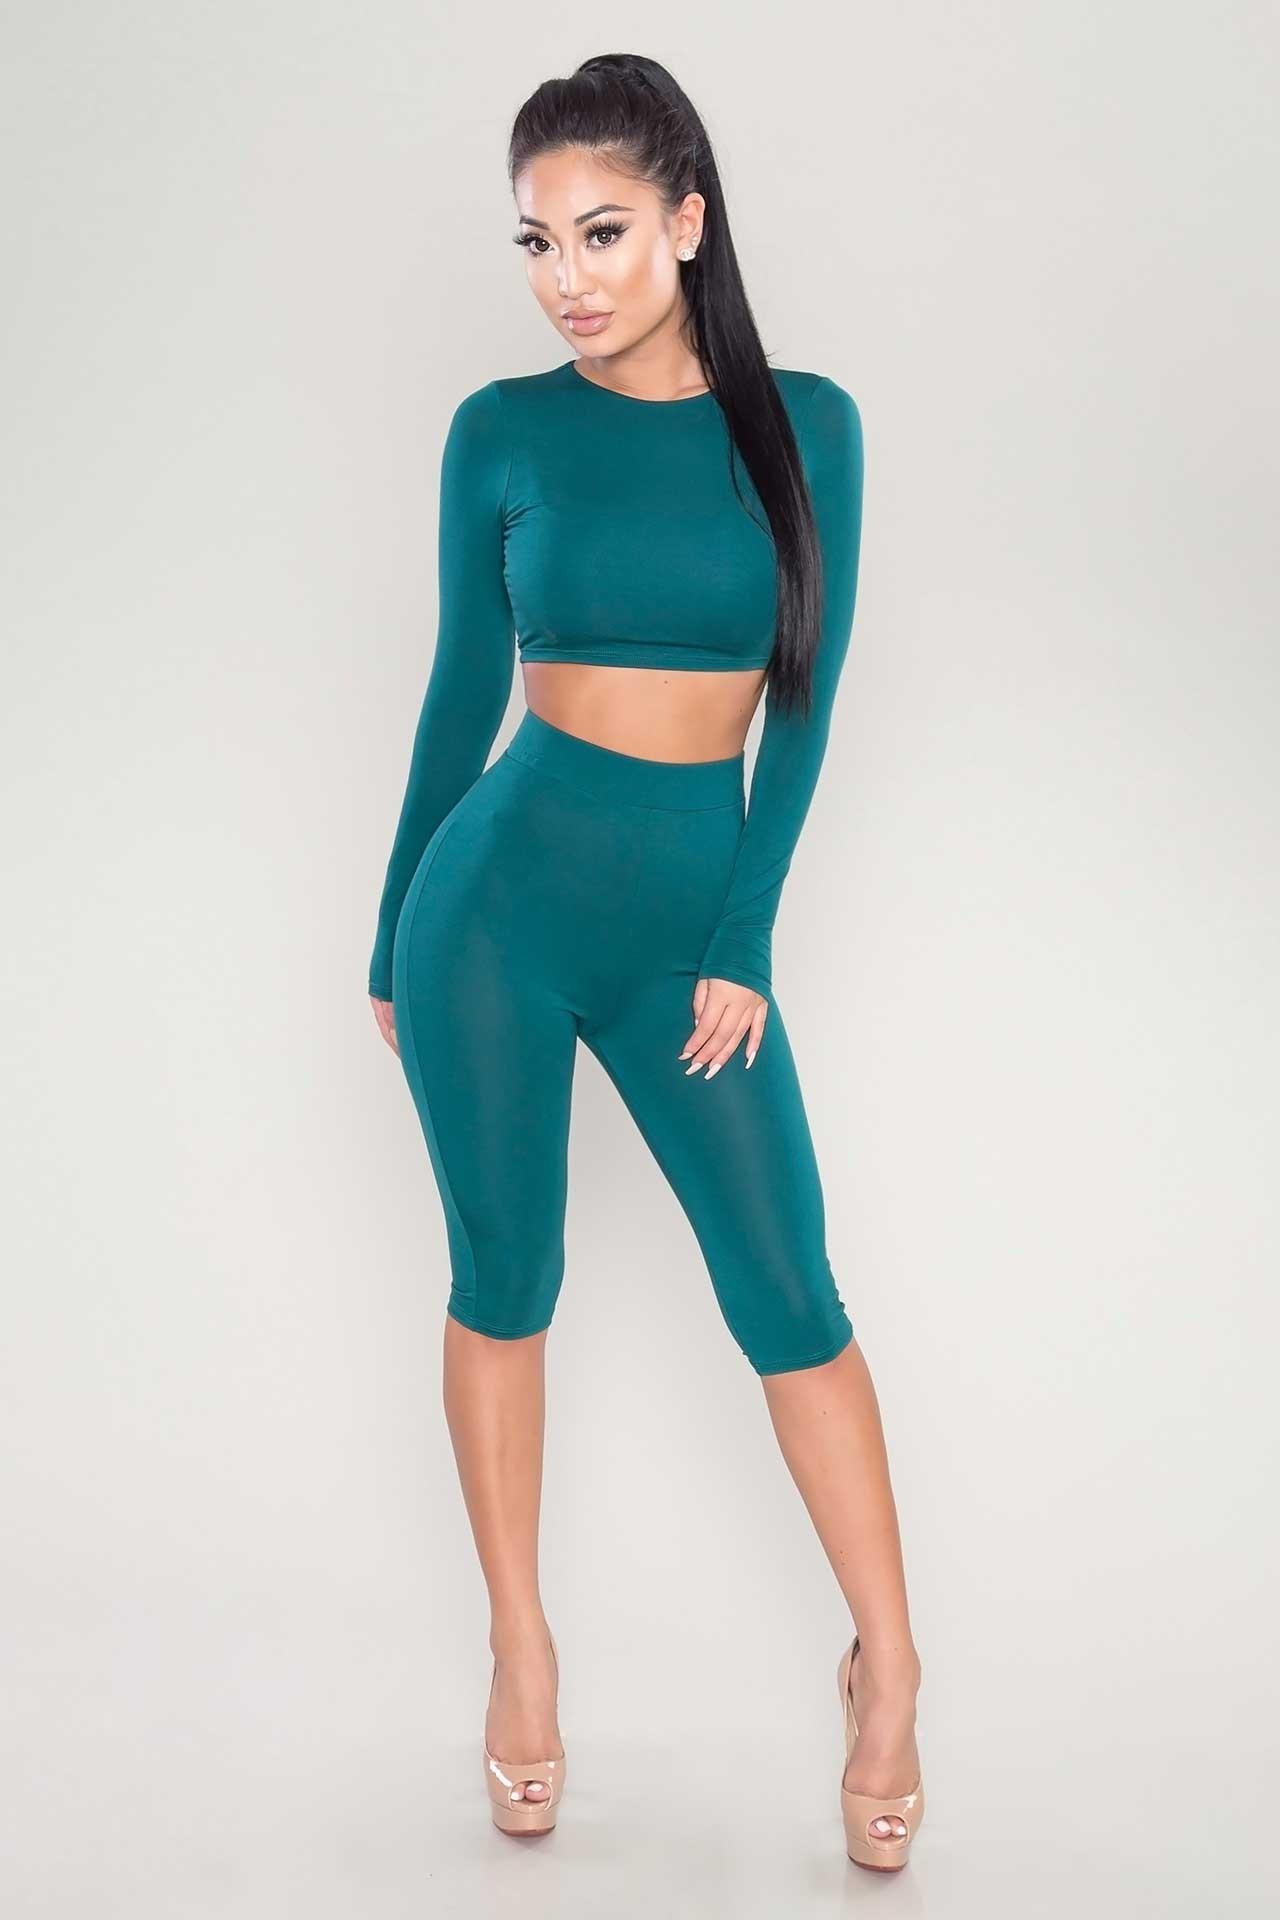 U30102017 Casual Women Two Piece Piece Outfits Jumpsuits Long Sleeve ( ^ ^)u3063 Bodycon Bodycon 2 Piece ...